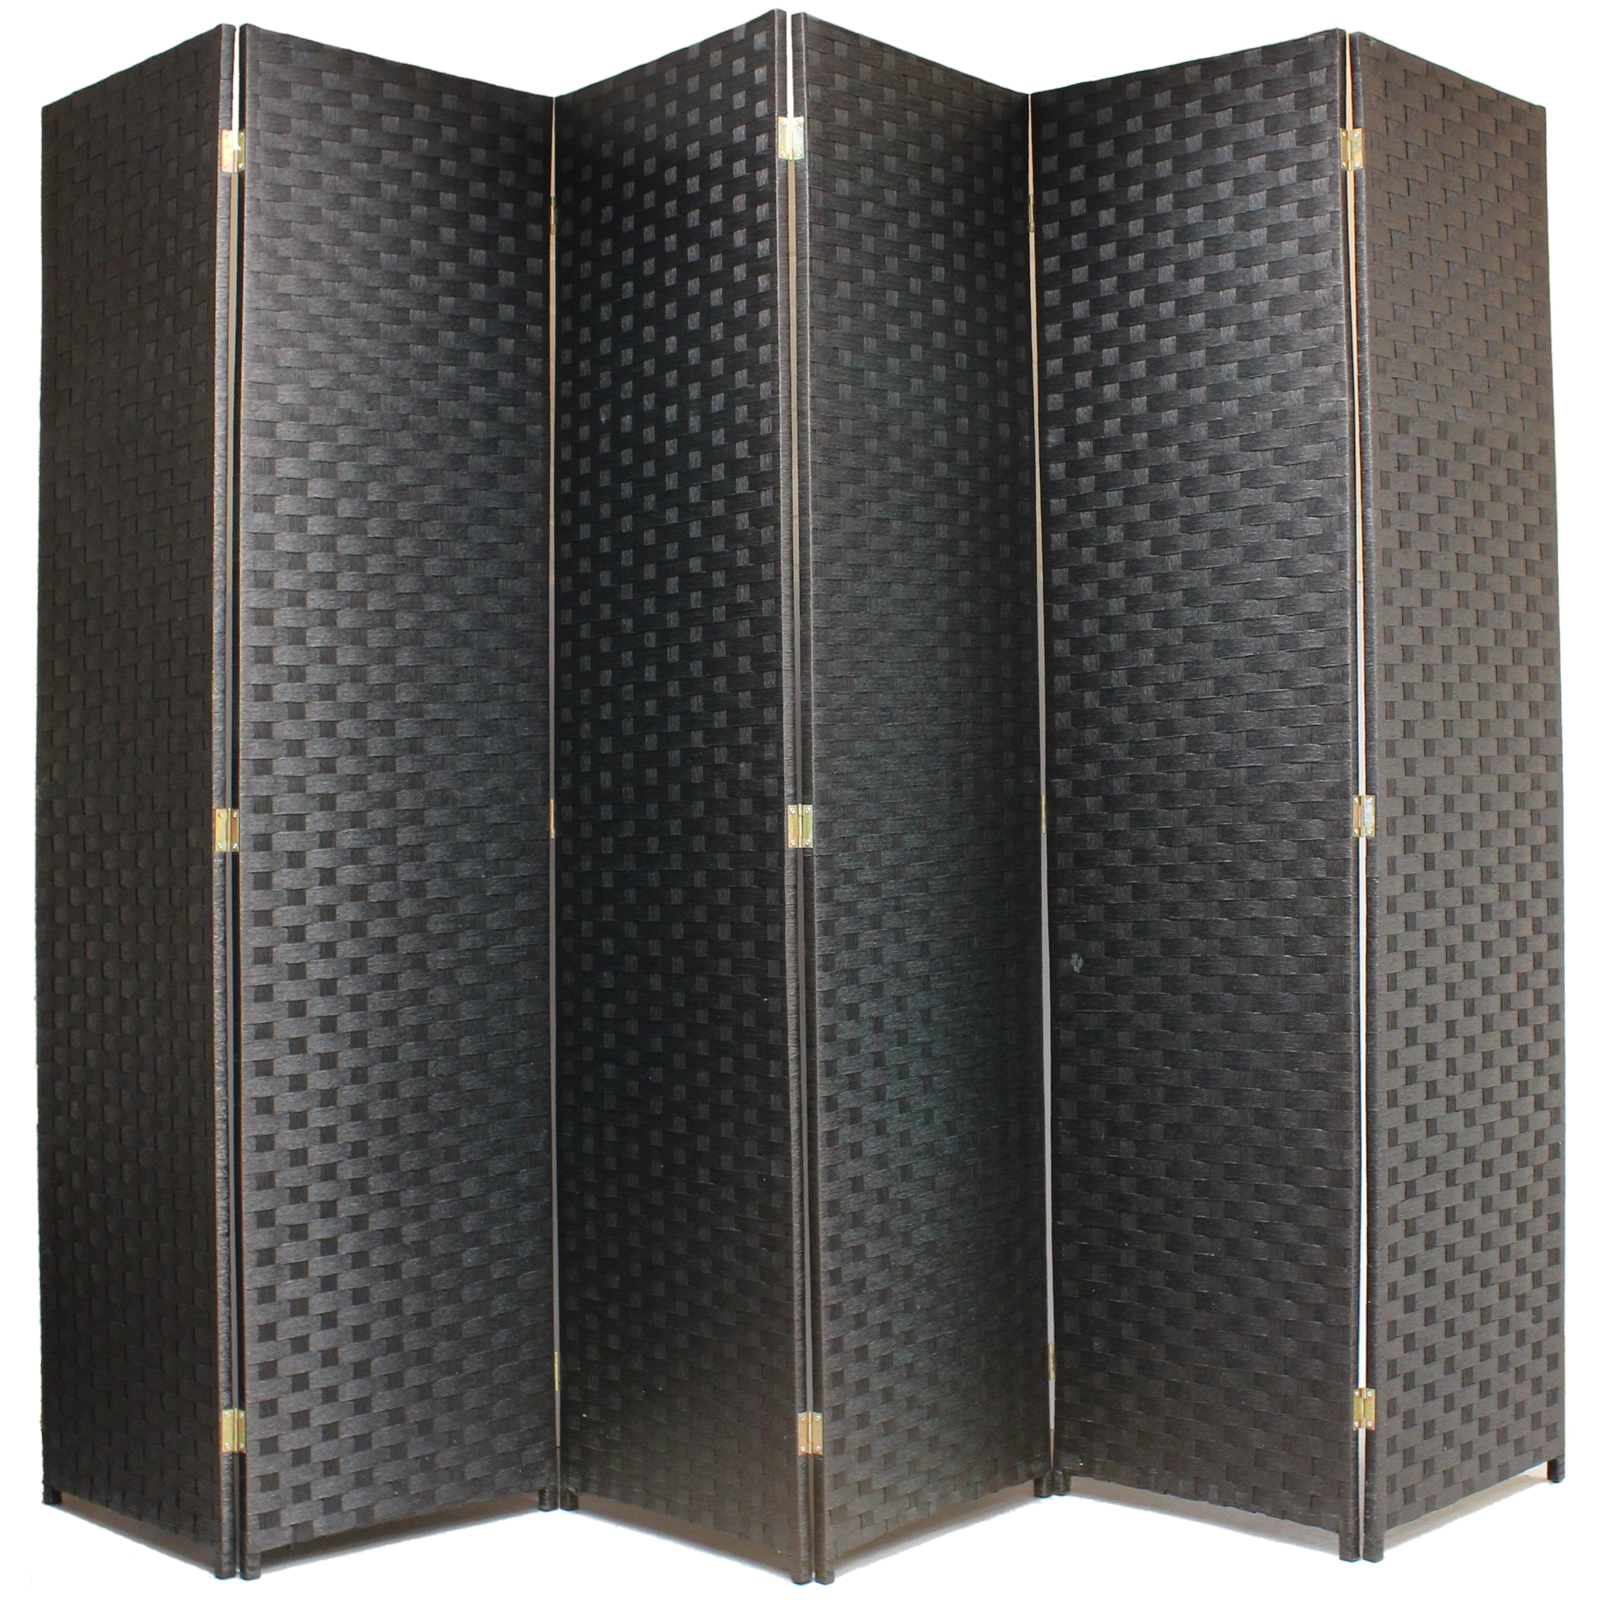 hand made woven wicker room divider separator panelprivacy. Black Bedroom Furniture Sets. Home Design Ideas